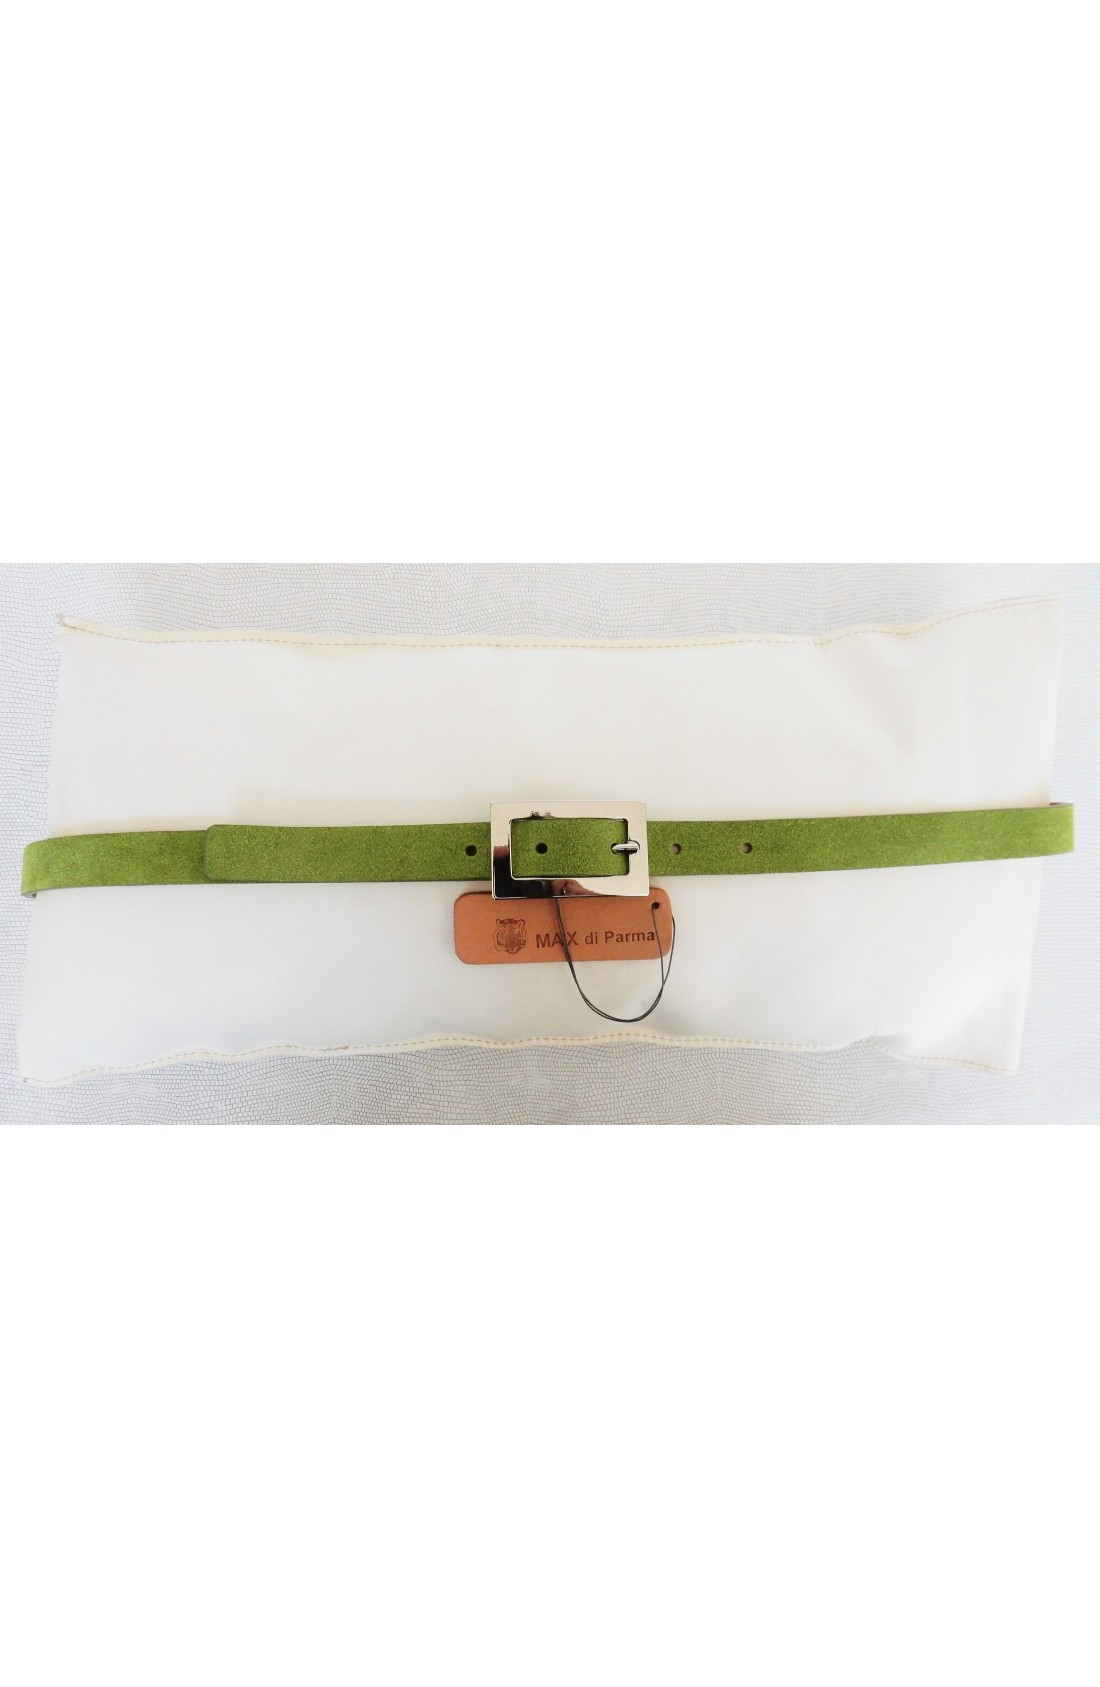 art. 603 SCAMOSCIATO mm.20 var.63 verde aloe fibbia B 919 (4)